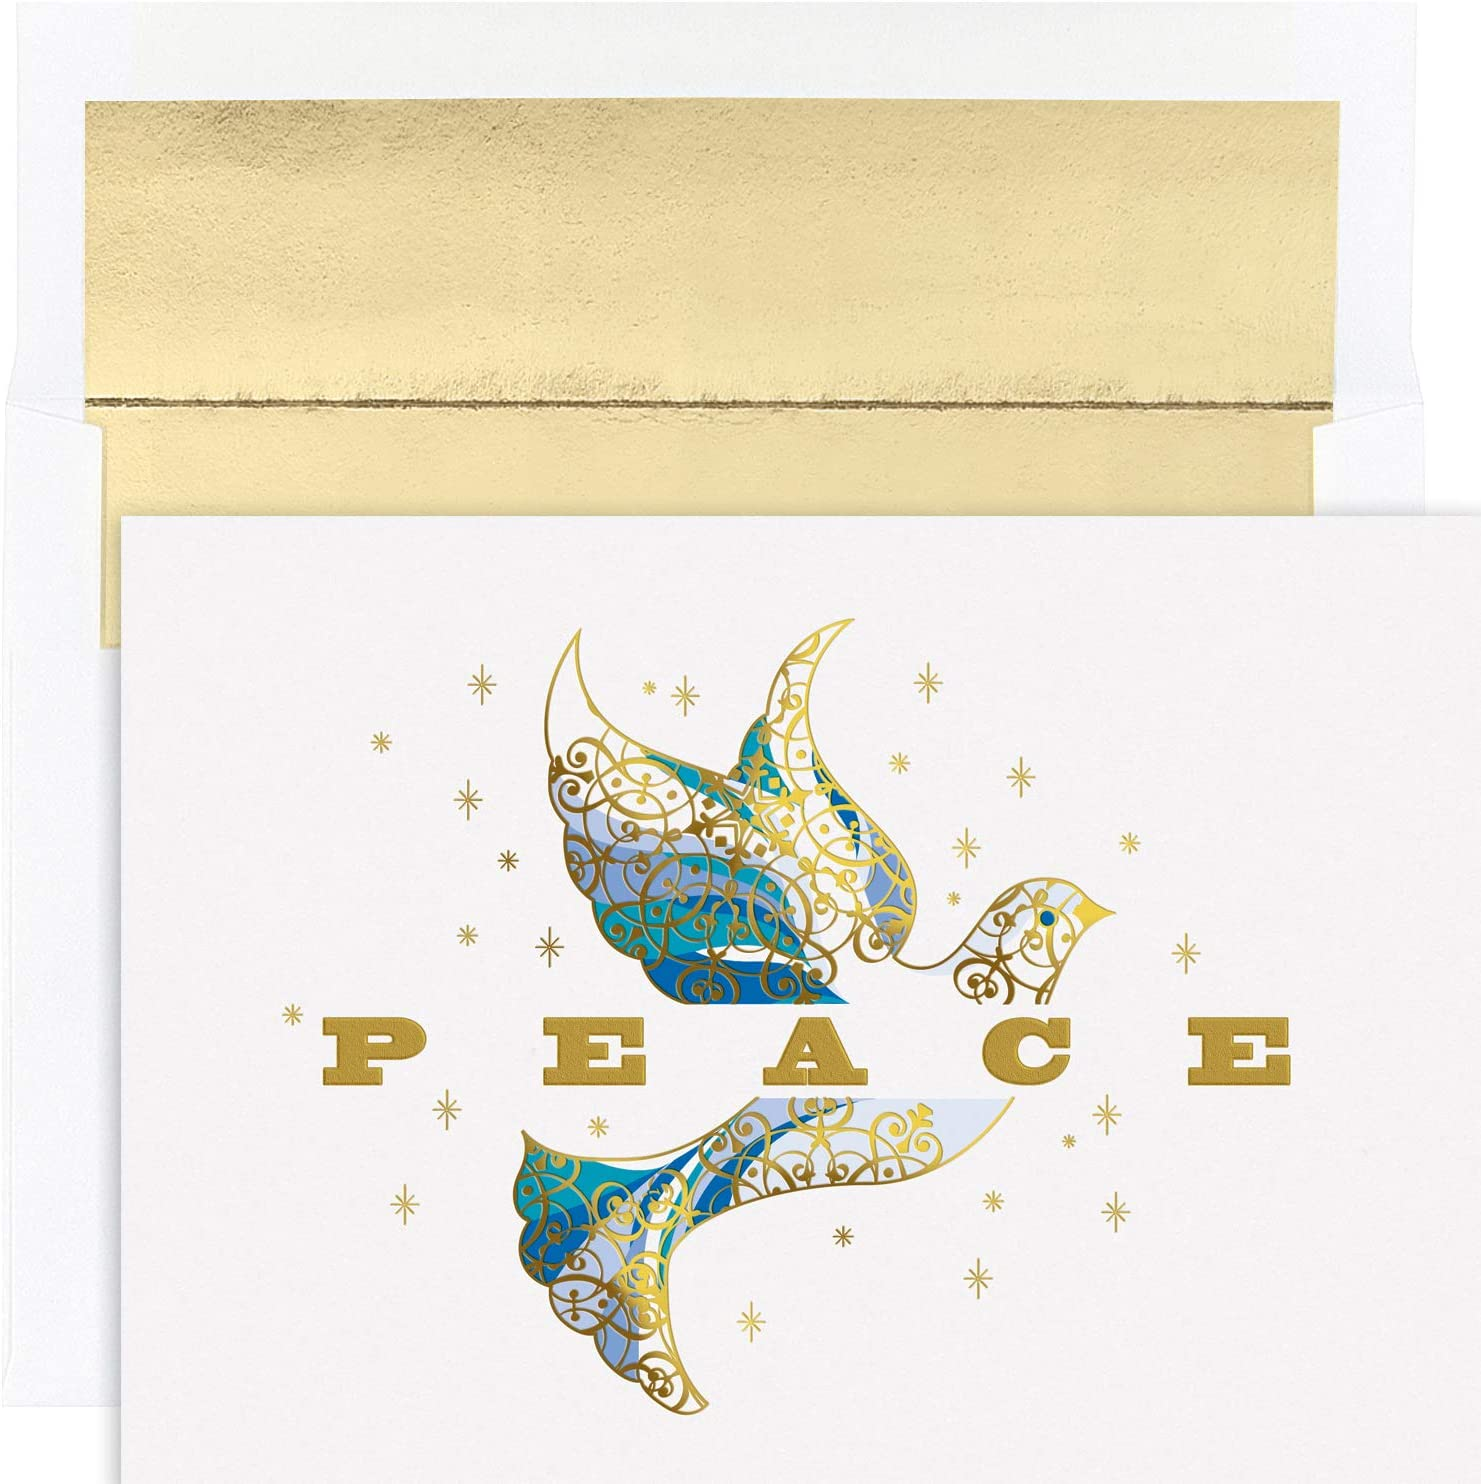 Masterpiece Studios Holiday Collection 16 Cards / 16 Foil Lined Envelopes, Elegant Dove